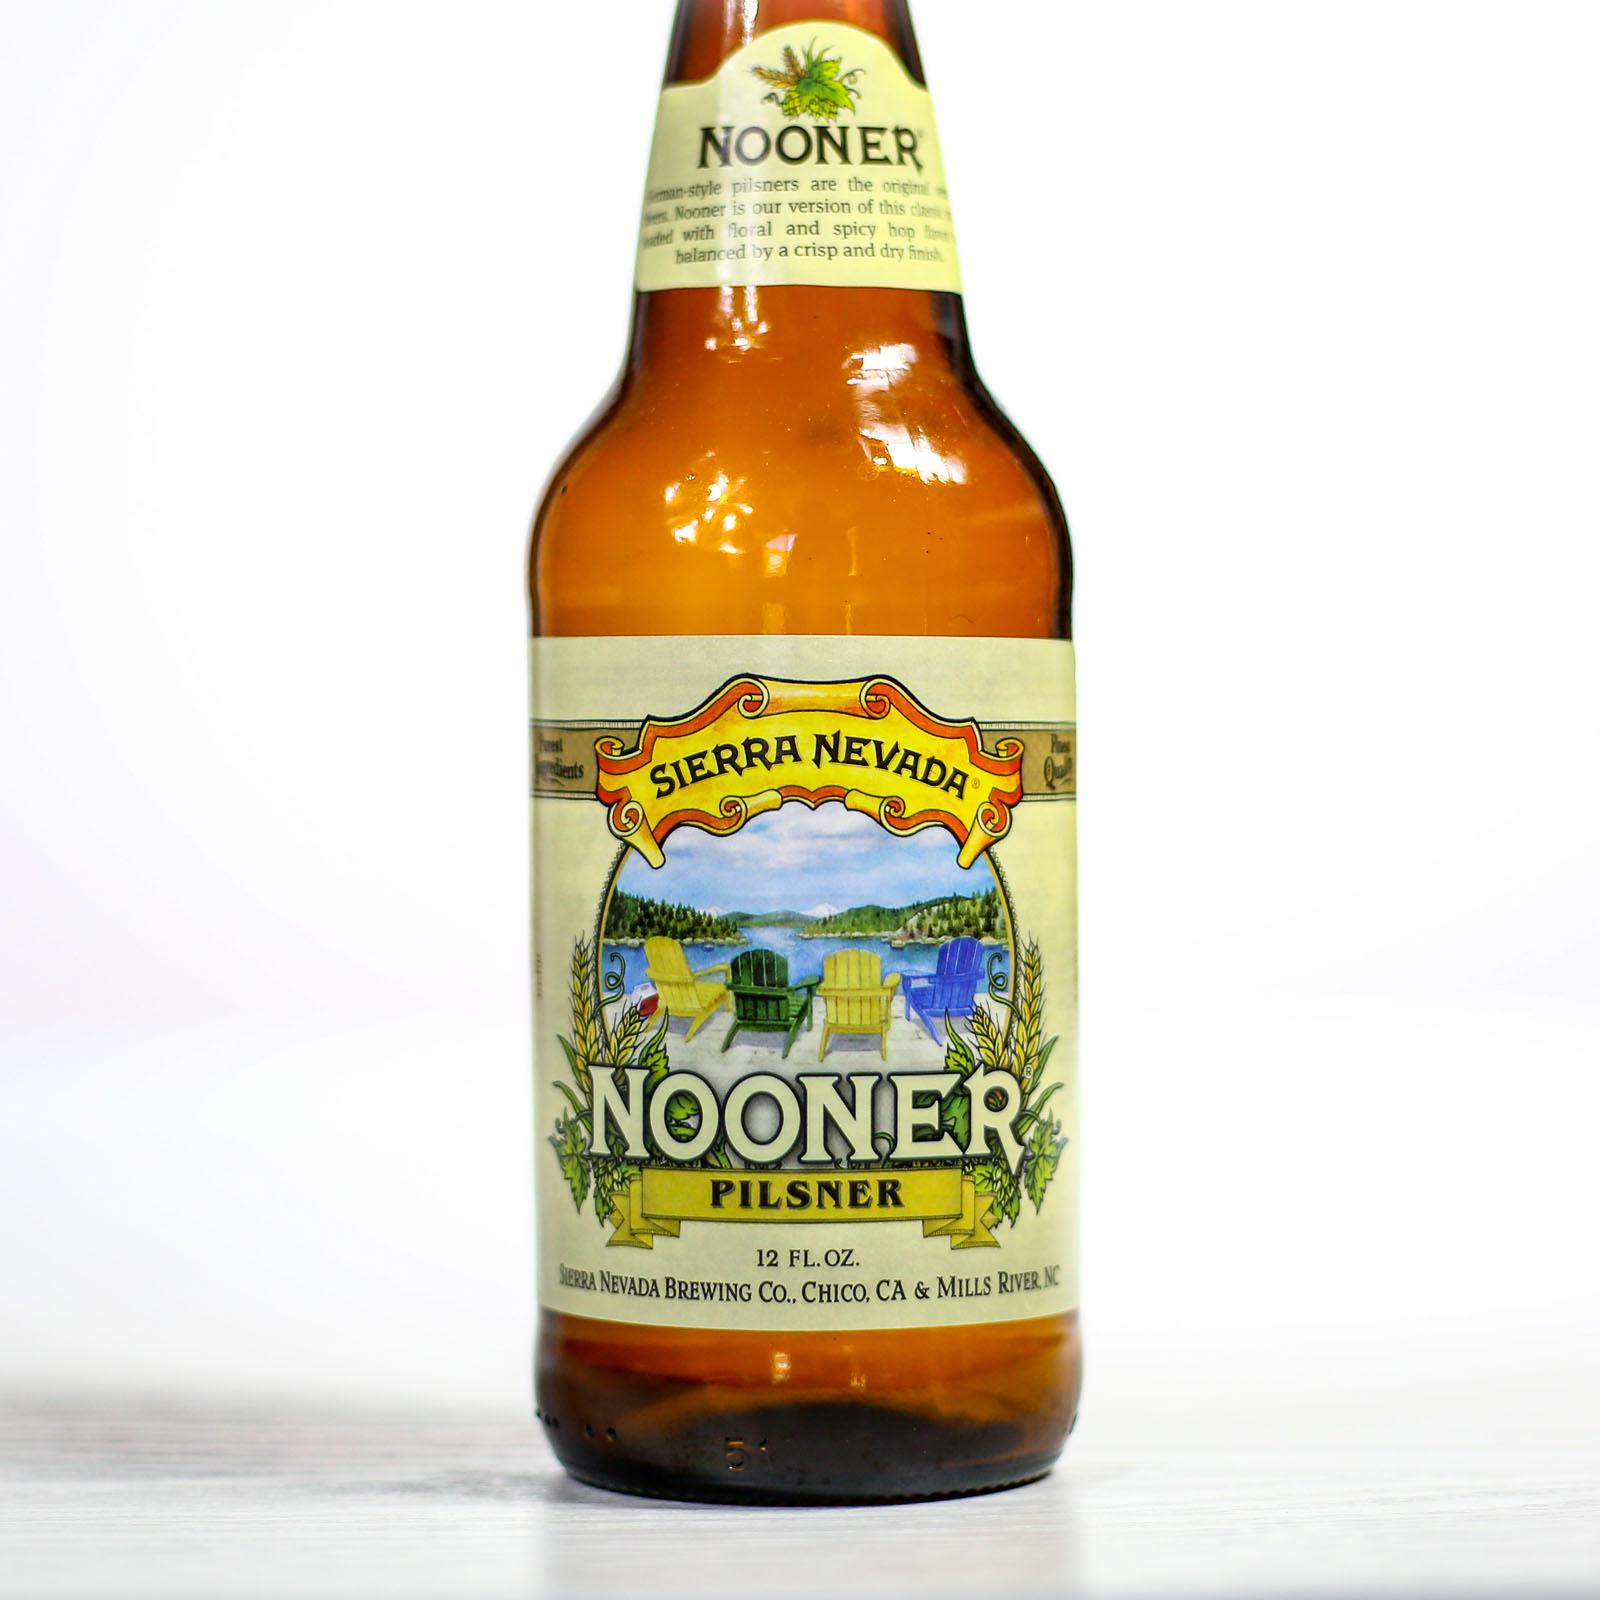 Sierra Nevada Brewing Co. - Nooner Pilsner